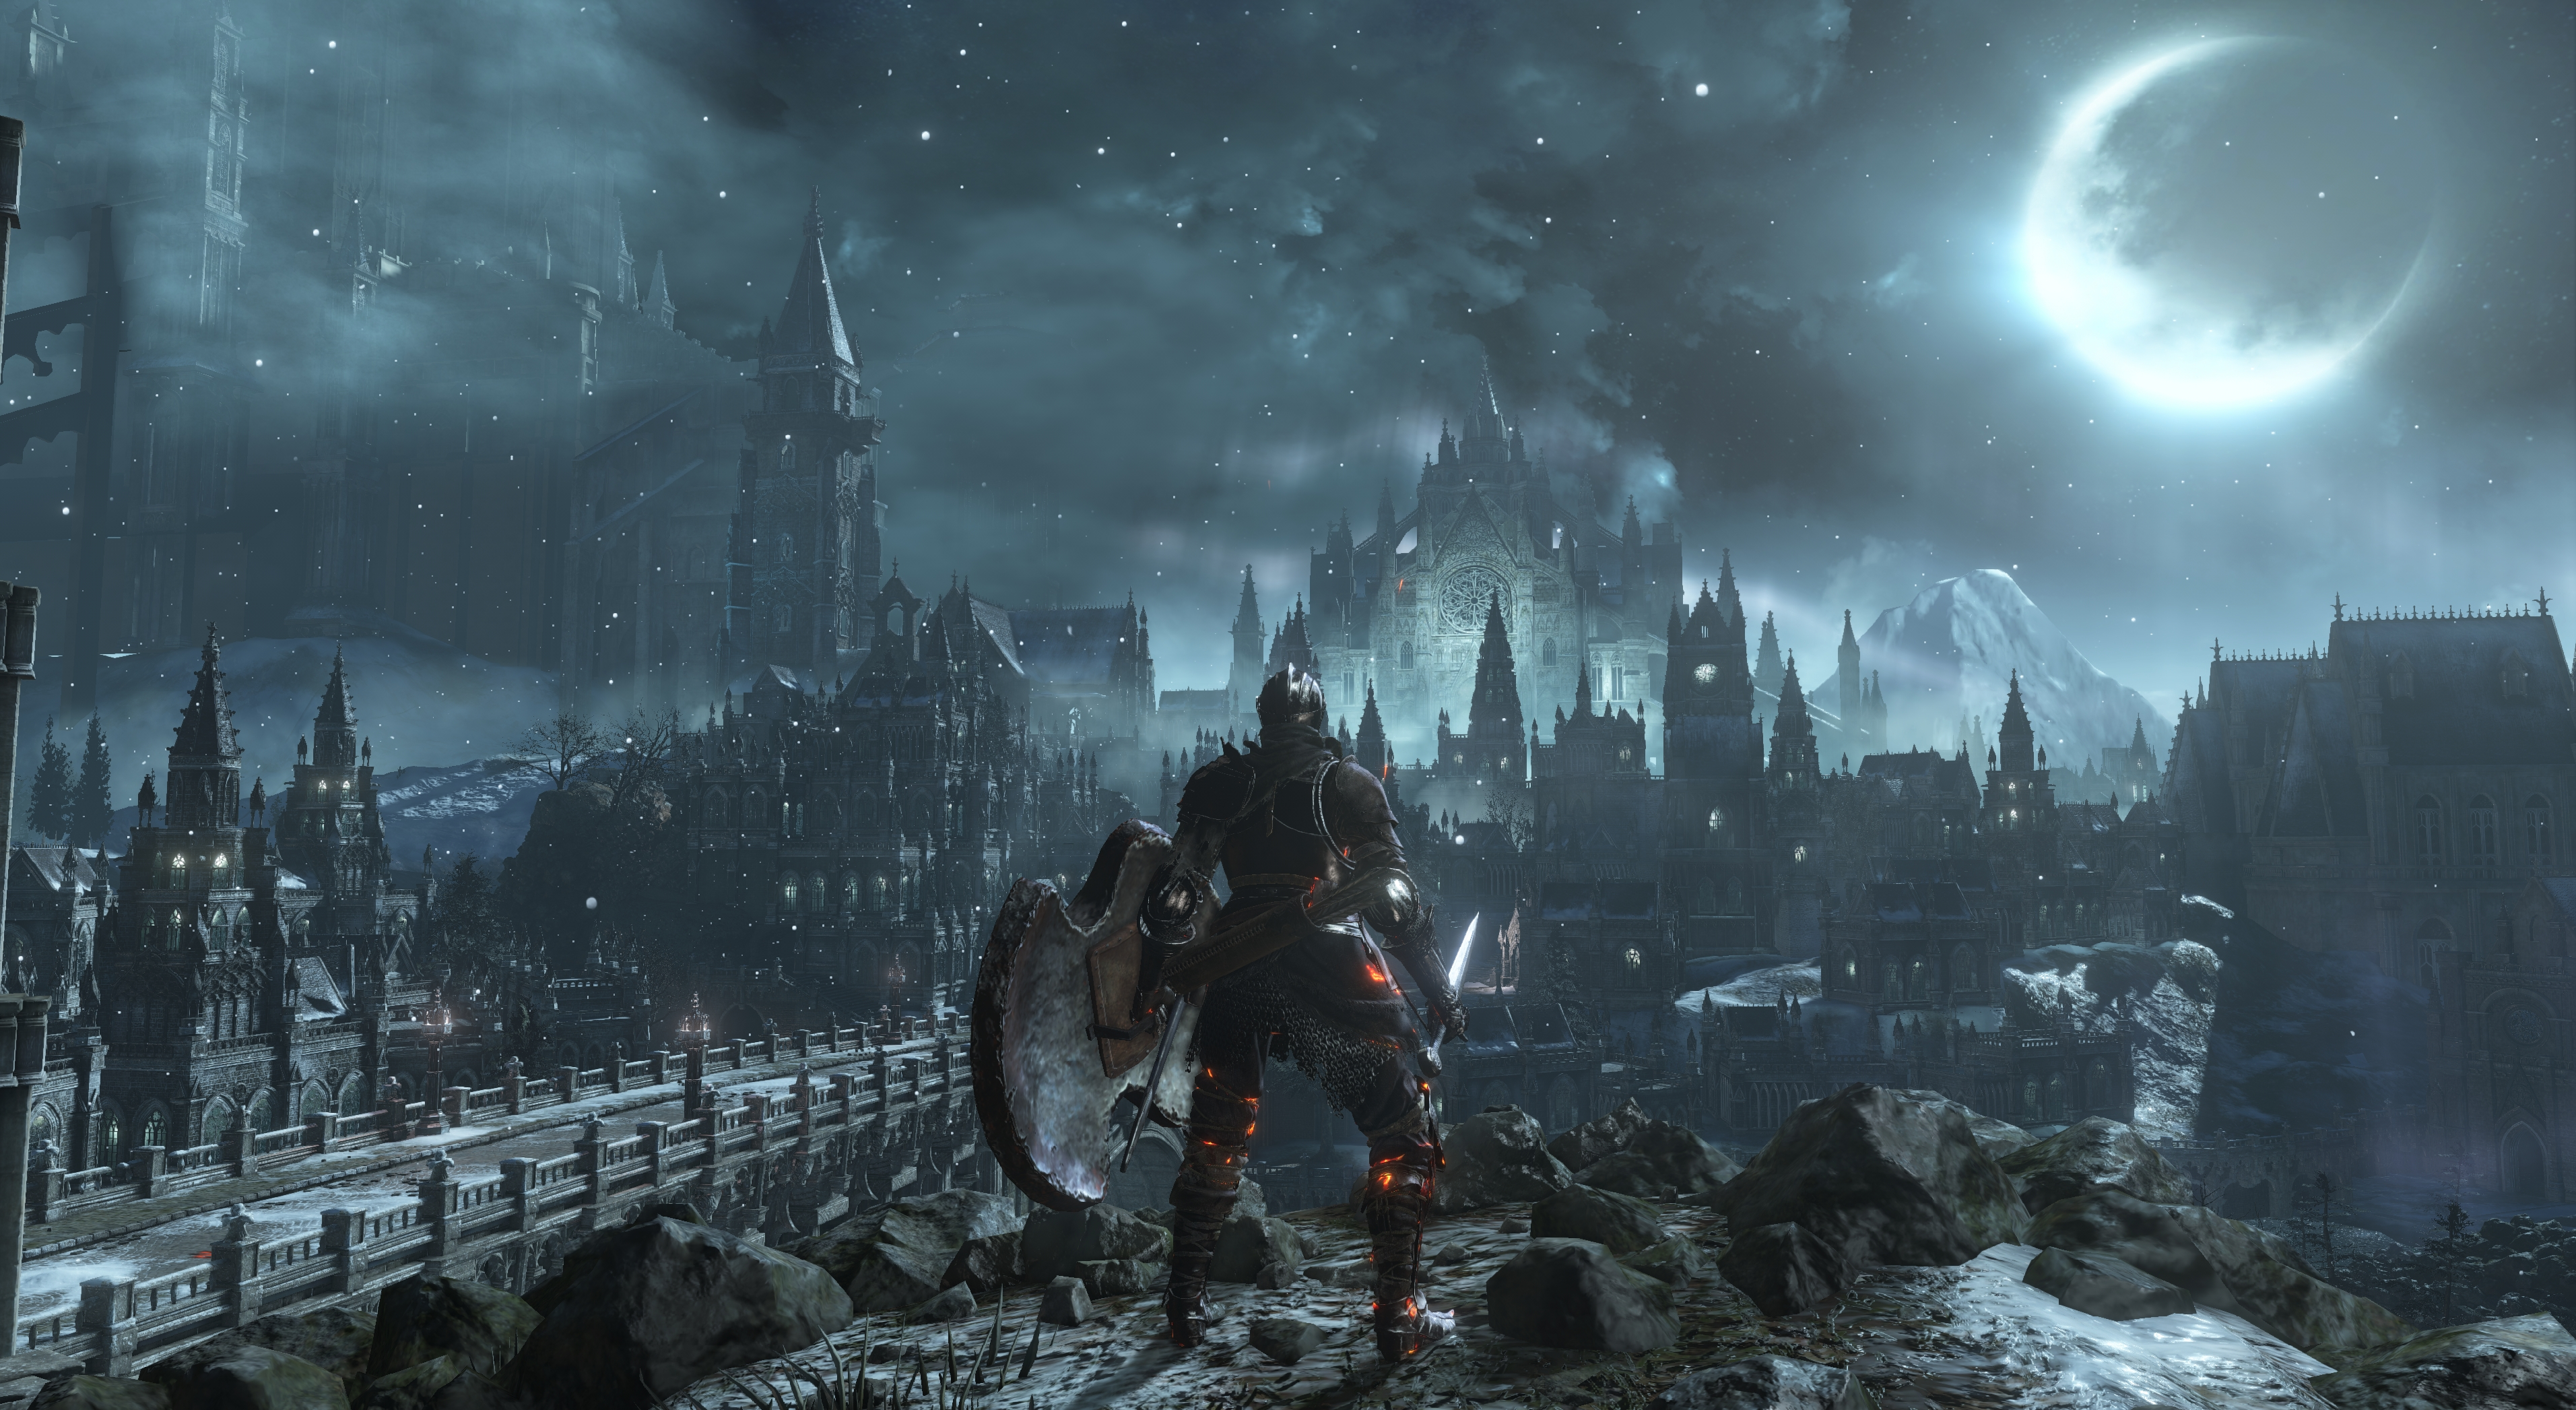 Dark Souls 3 4k Pic 2 By User619 On Deviantart